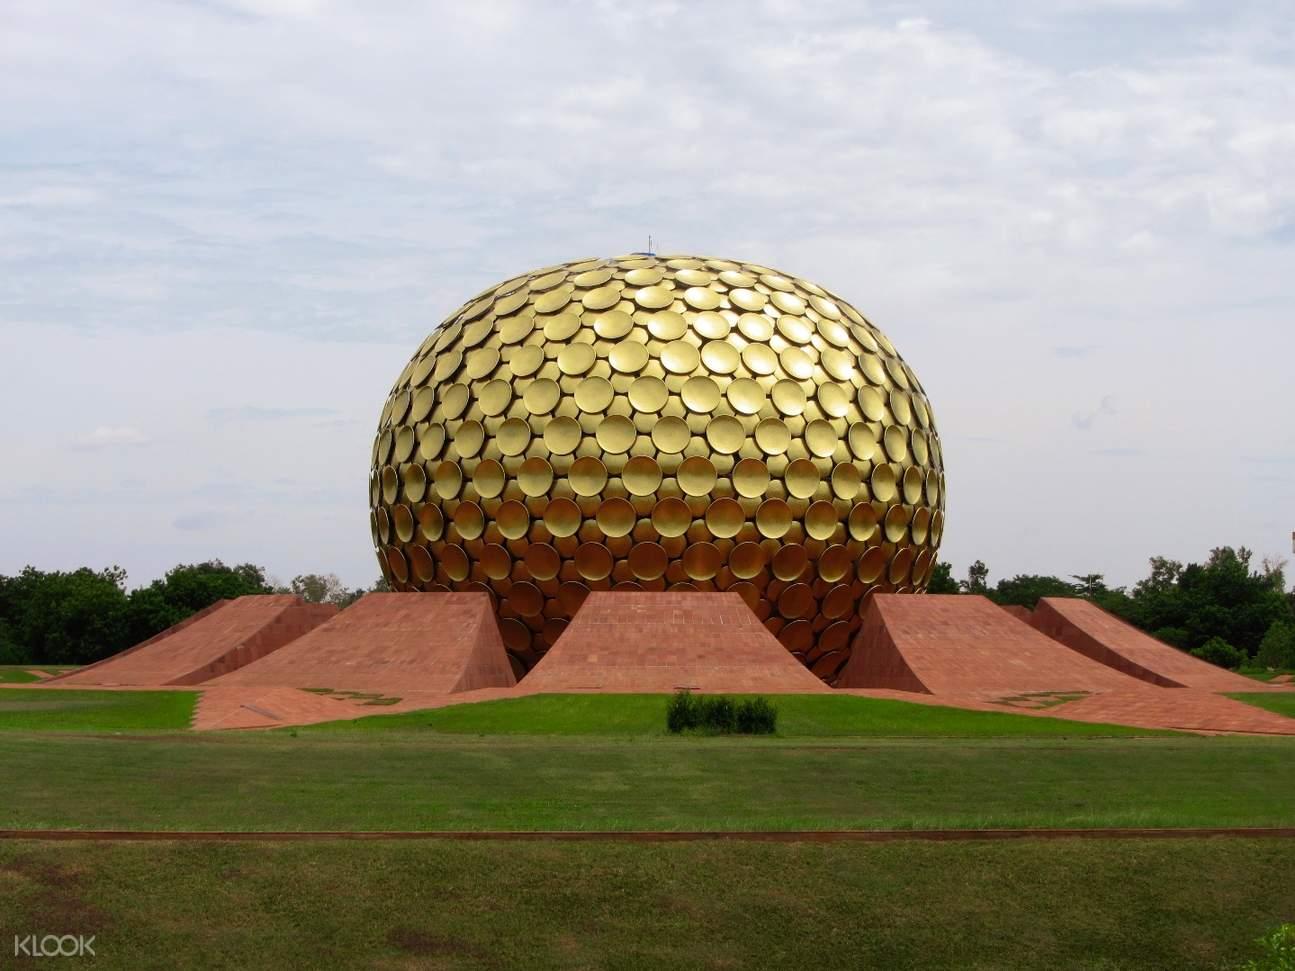 Matrimandir 巨大黄金球